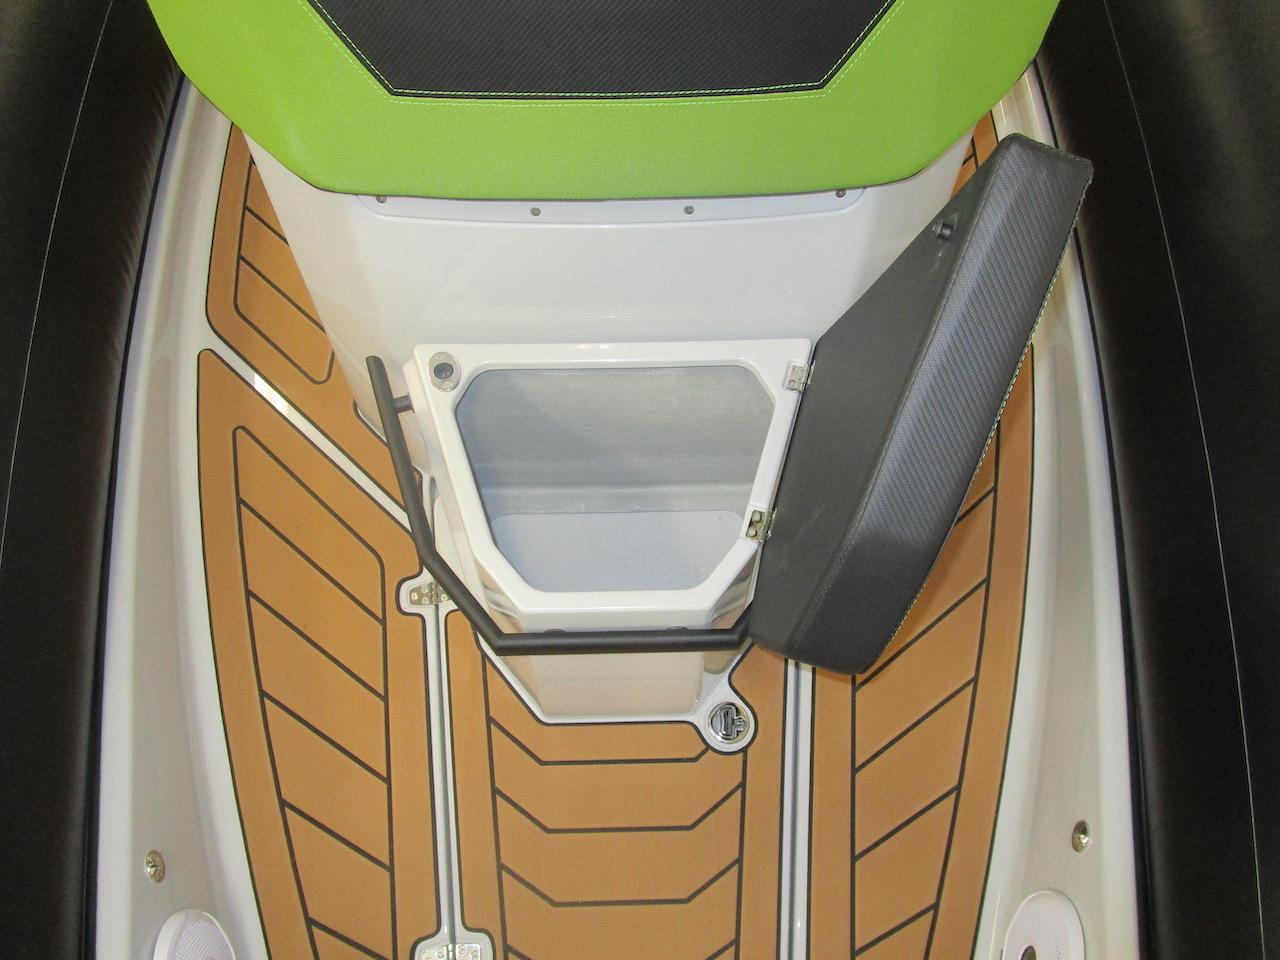 GRAND DRIVE D600 deck locker